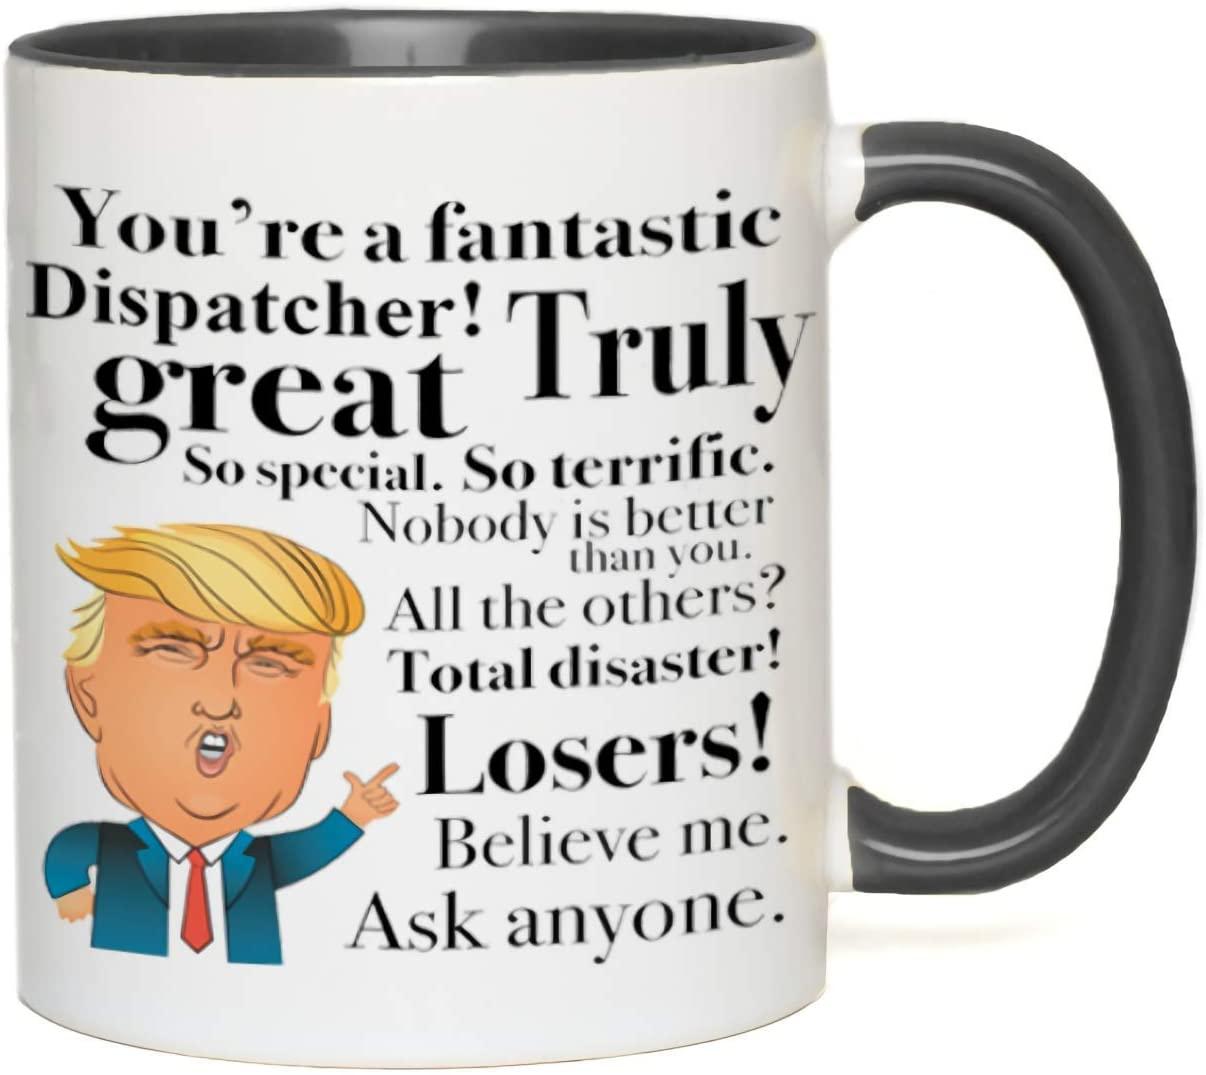 Donald Trump Coffee 2 Tone Mug - For Dispatcher Mediator Emissary Courier Mom Farmer Mather Father Day 11oz Black White